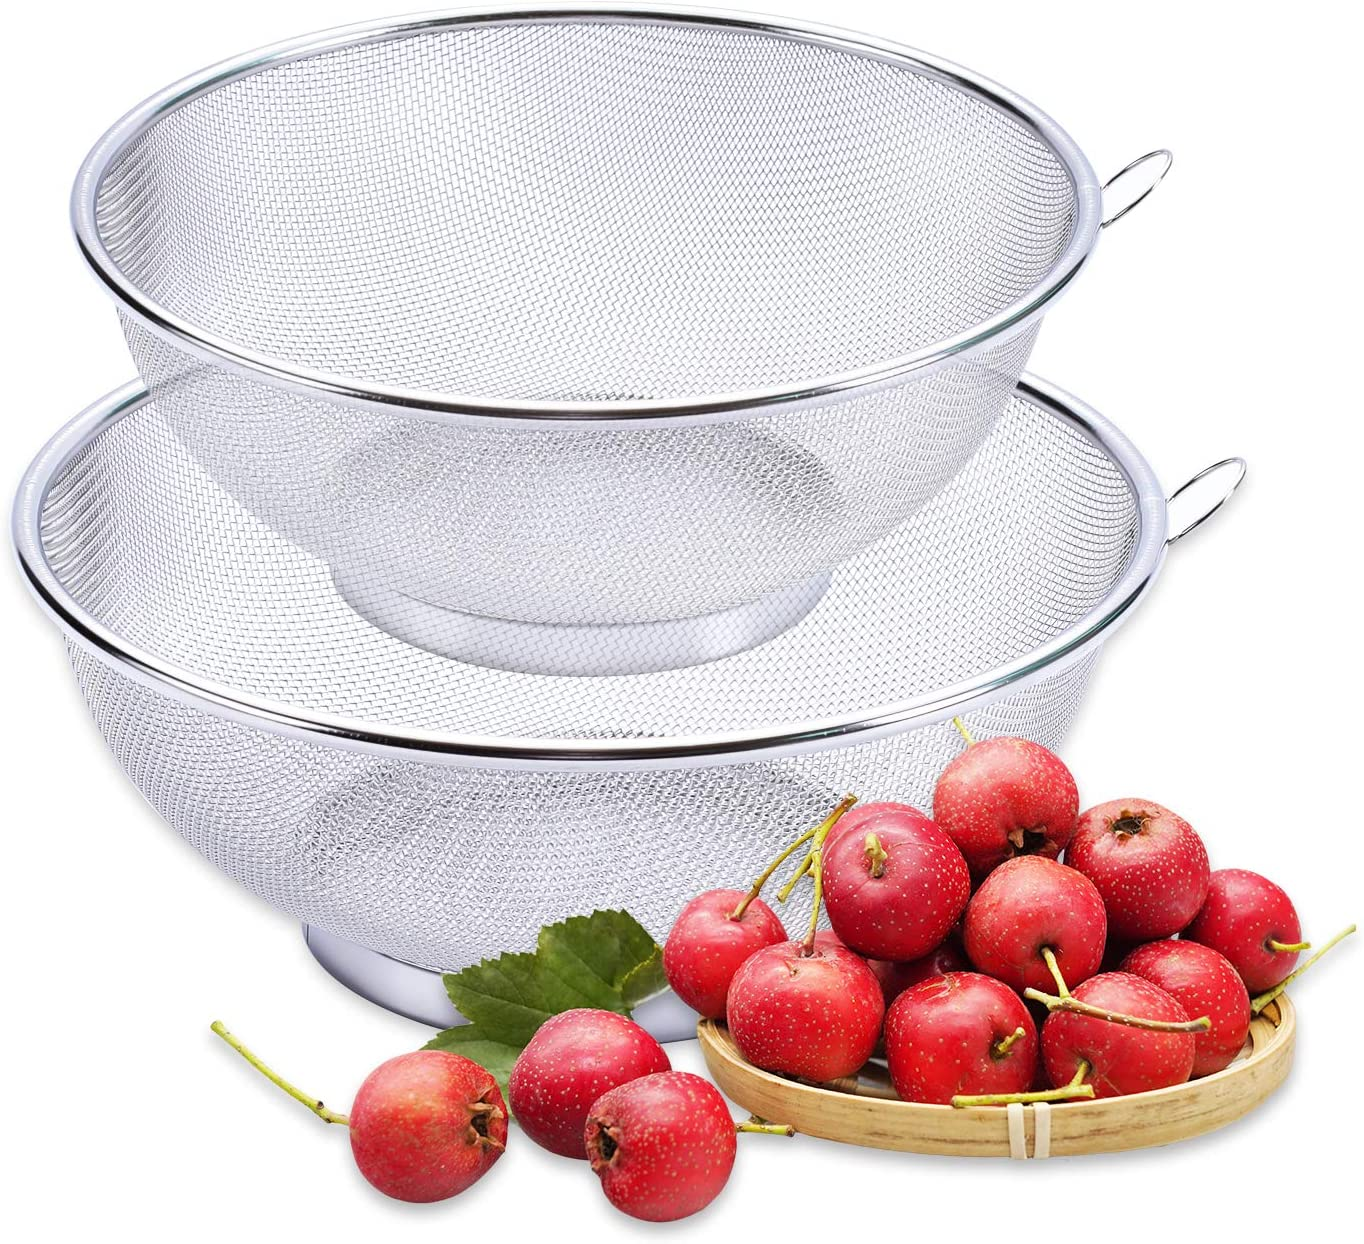 2Pcs Stainless Steel Mesh Colander Strainer Basket Drainer- Fine Mesh Strainer Rice Washing Bowl, Colander Sieve Sifters for Kitchen